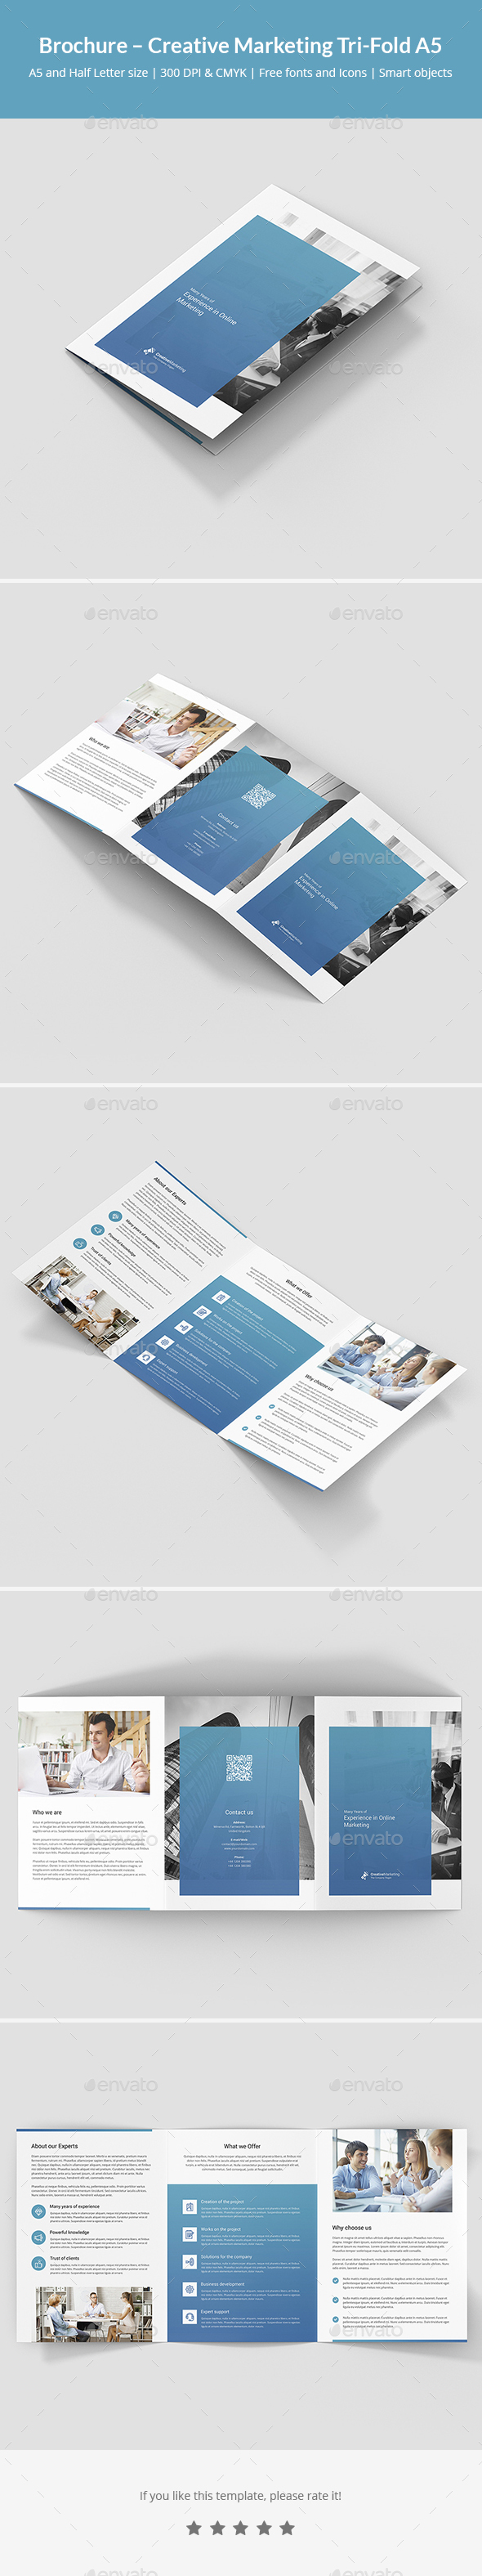 Brochure – Creative Marketing Tri-Fold A5 - Corporate Brochures